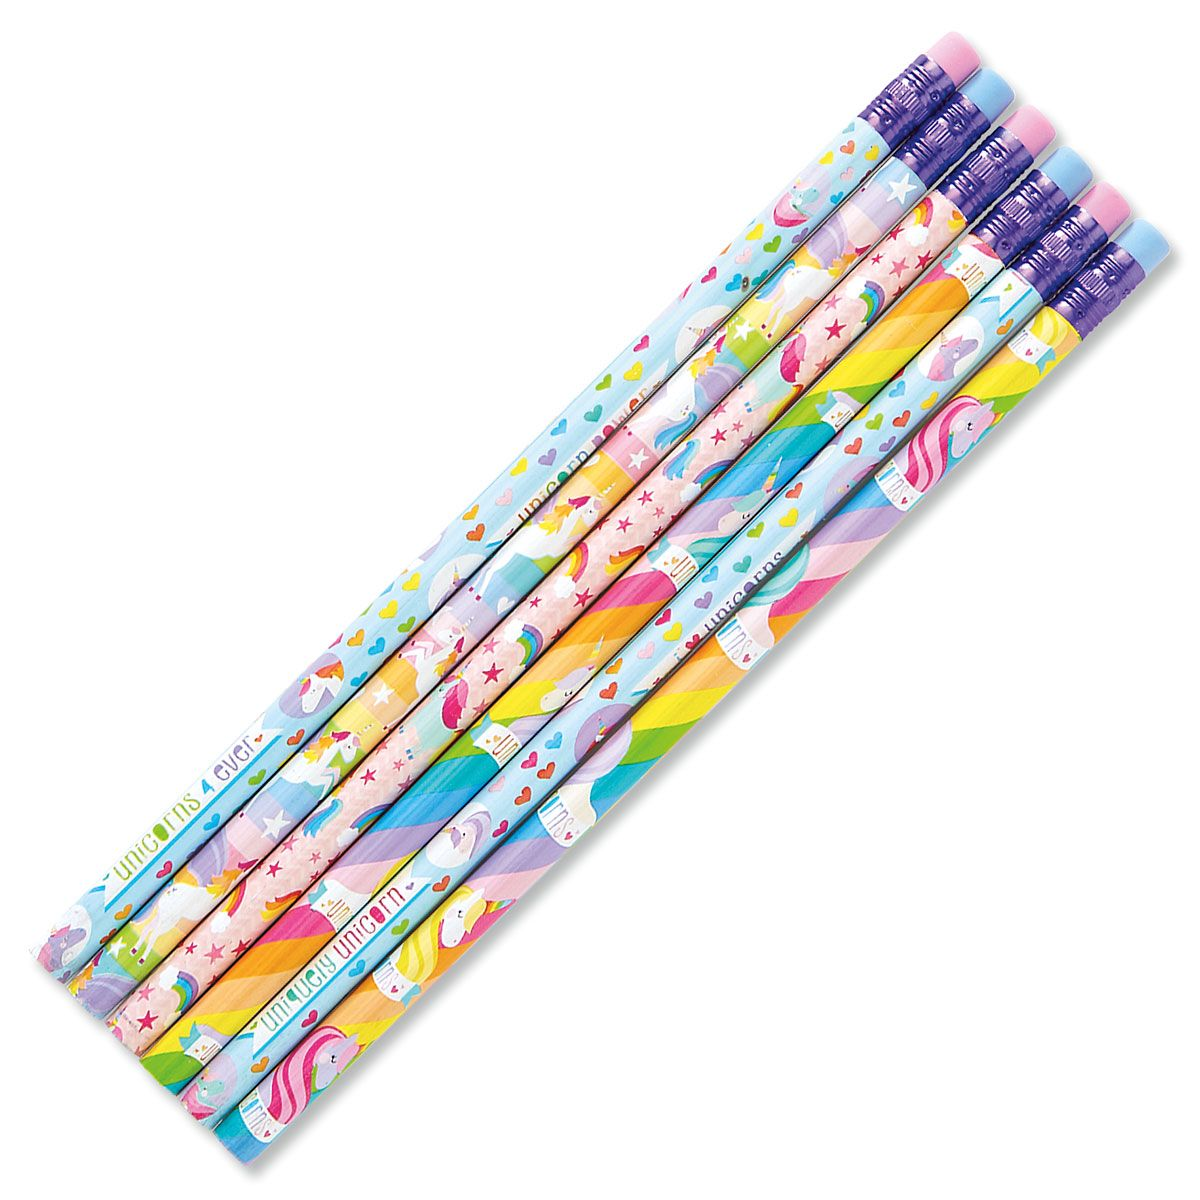 Unicorn #2 Hardwood Pencils